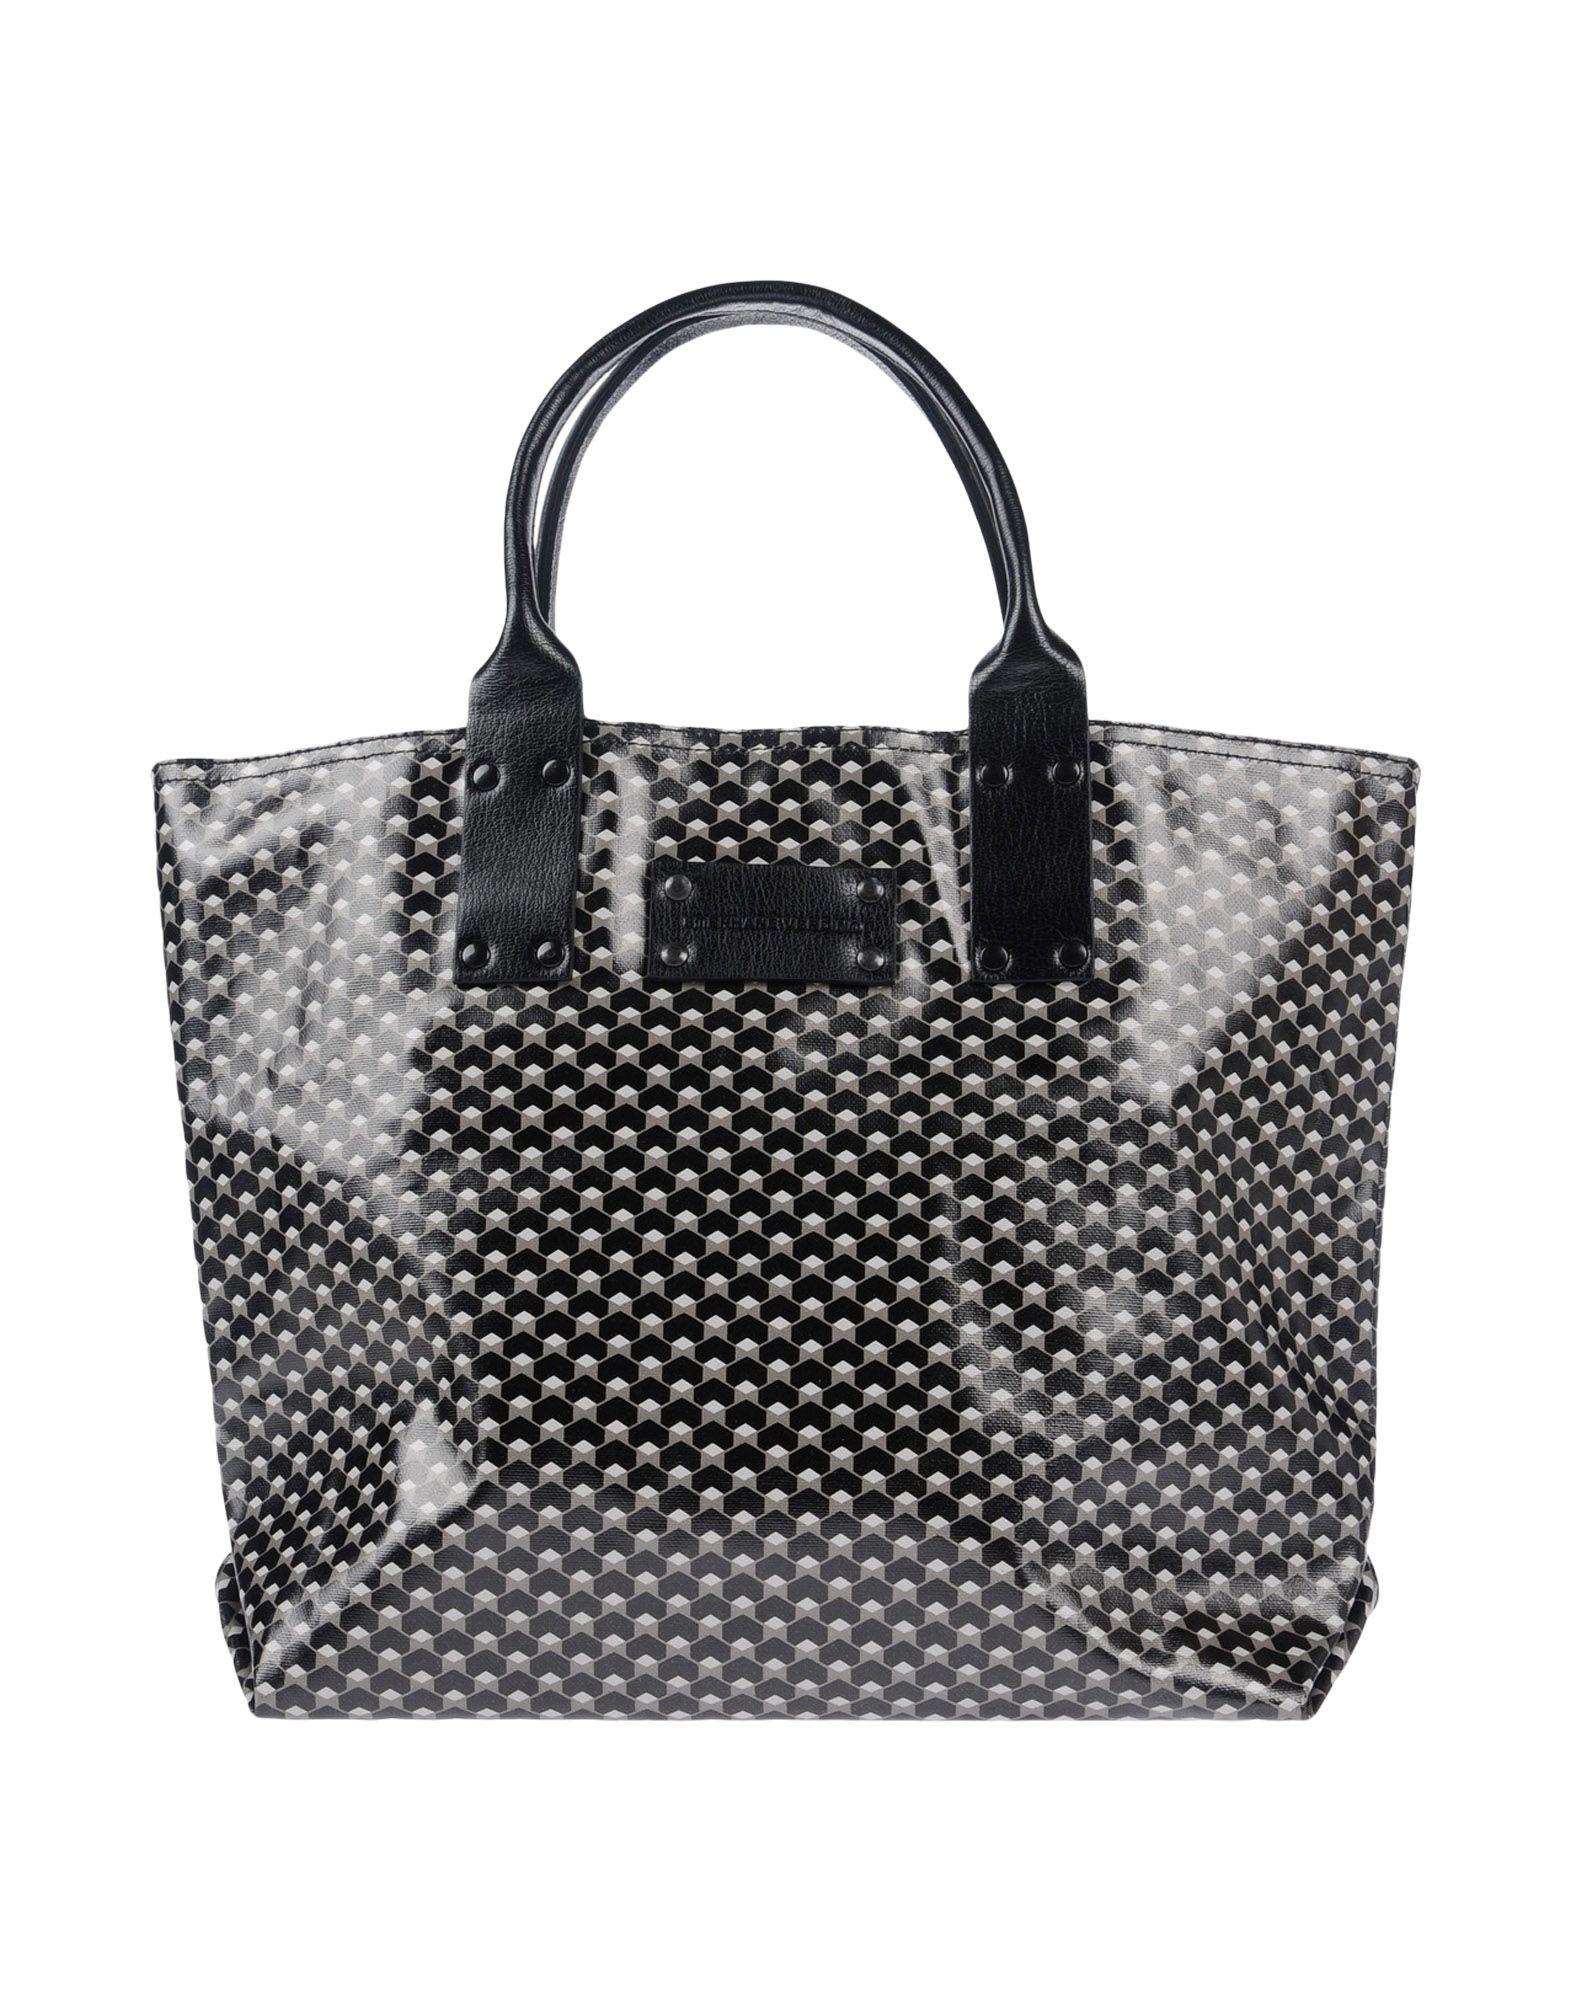 STEPHANE VERDINO Handbag in Black